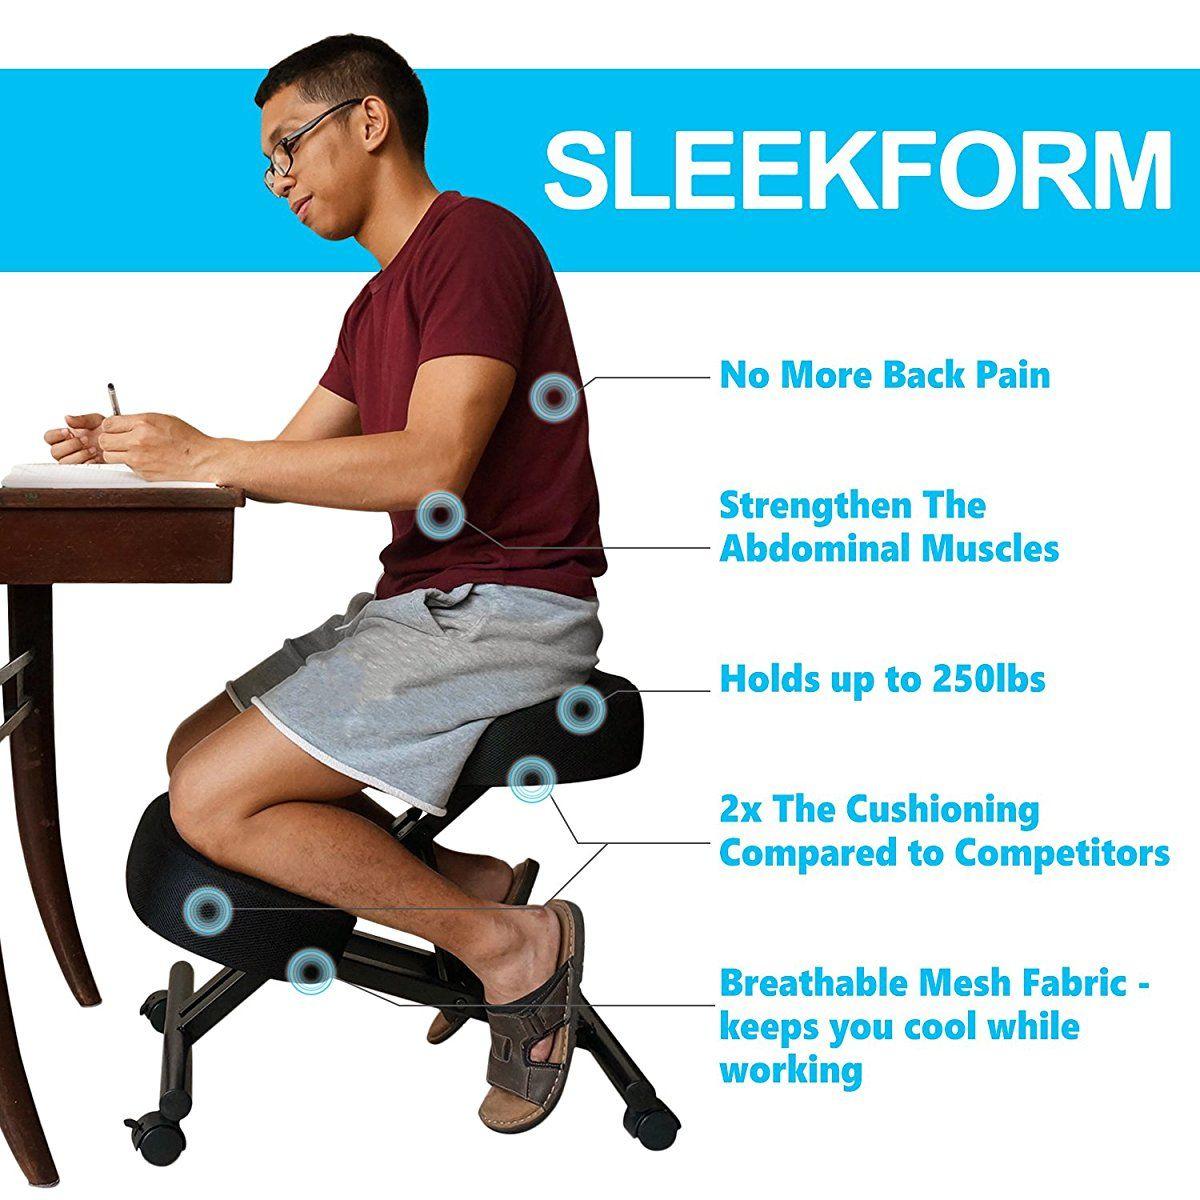 Sleekform Wheeled Kneeling Chair Replacement Hardware